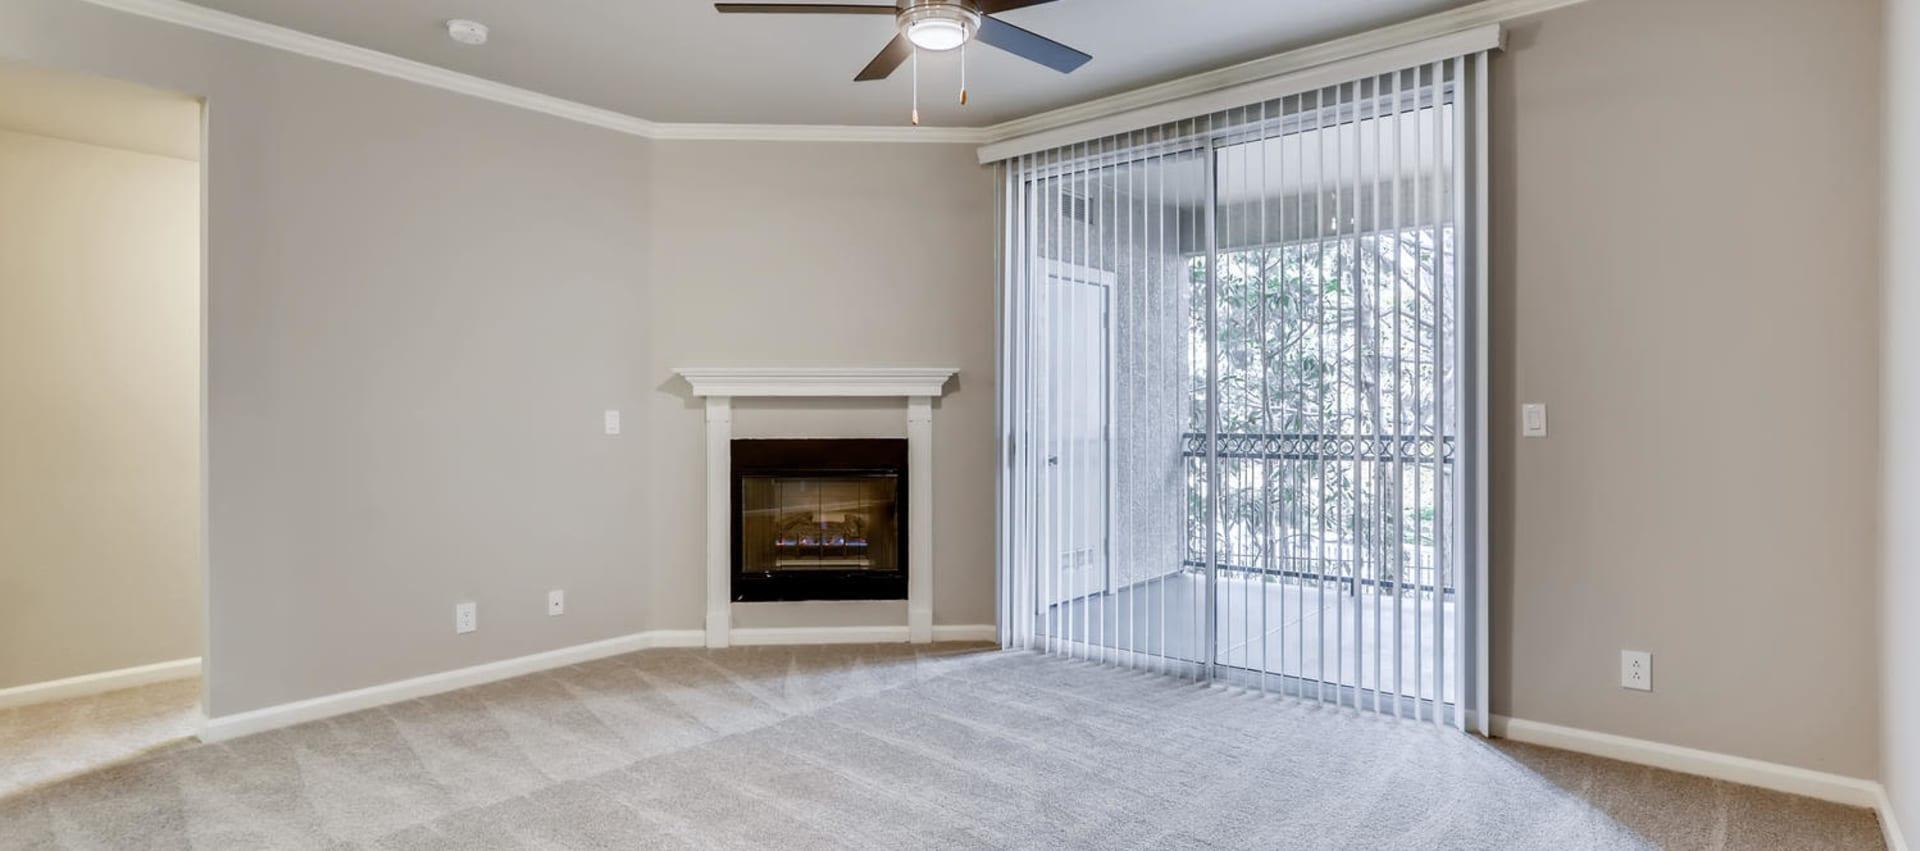 Living Room at Alize at Aliso Viejo Apartment Homes in Aliso Viejo, California